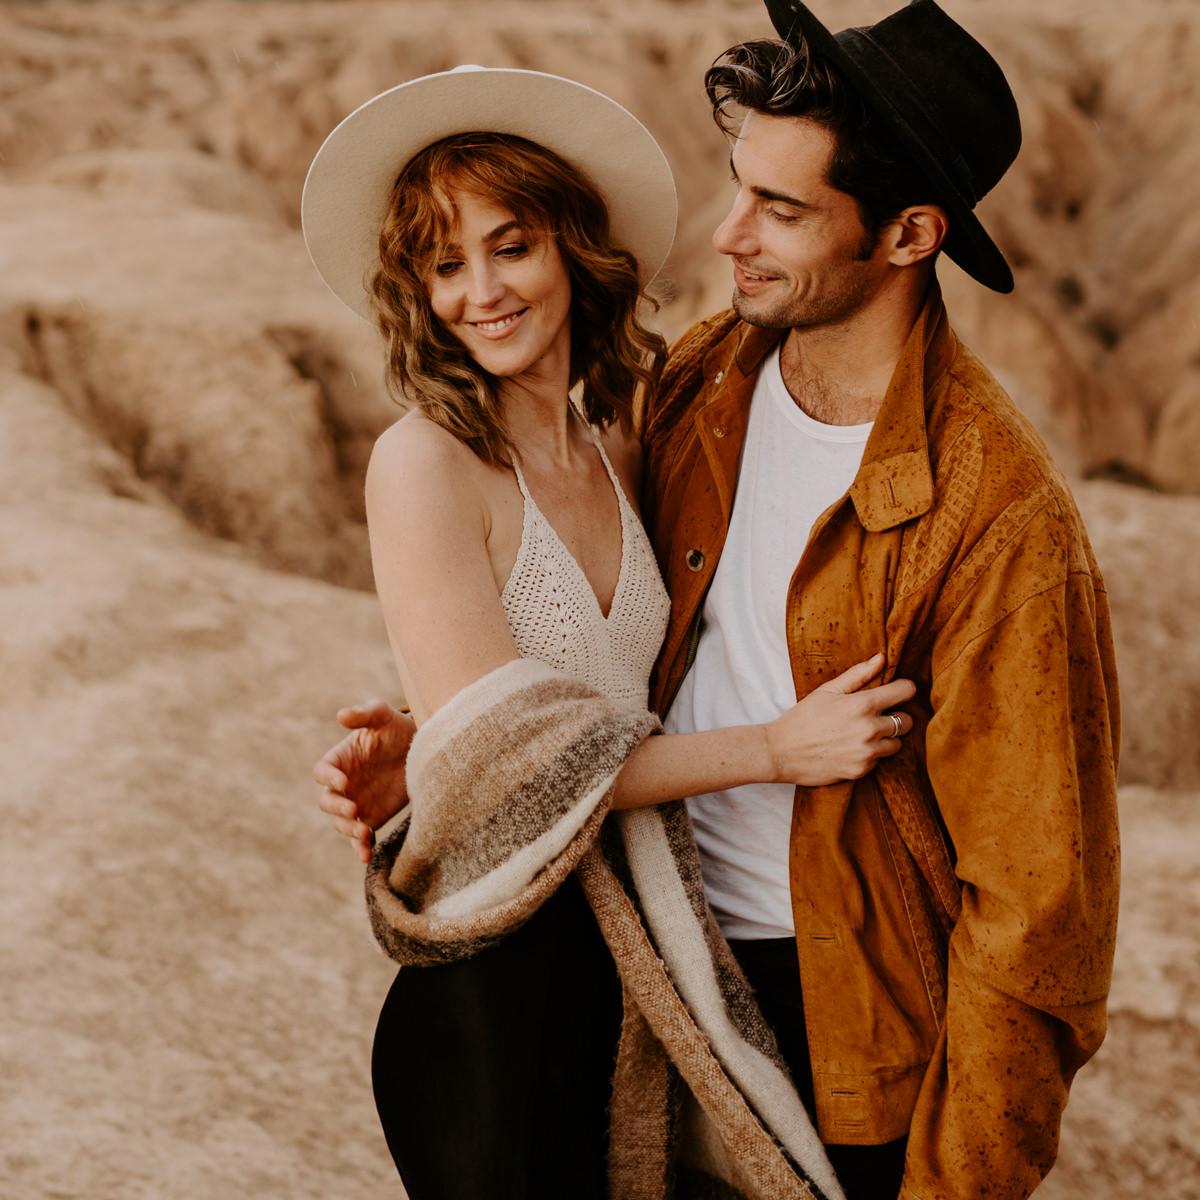 seance-couple-engagement-photographe-taroudant-dorothee-buteau